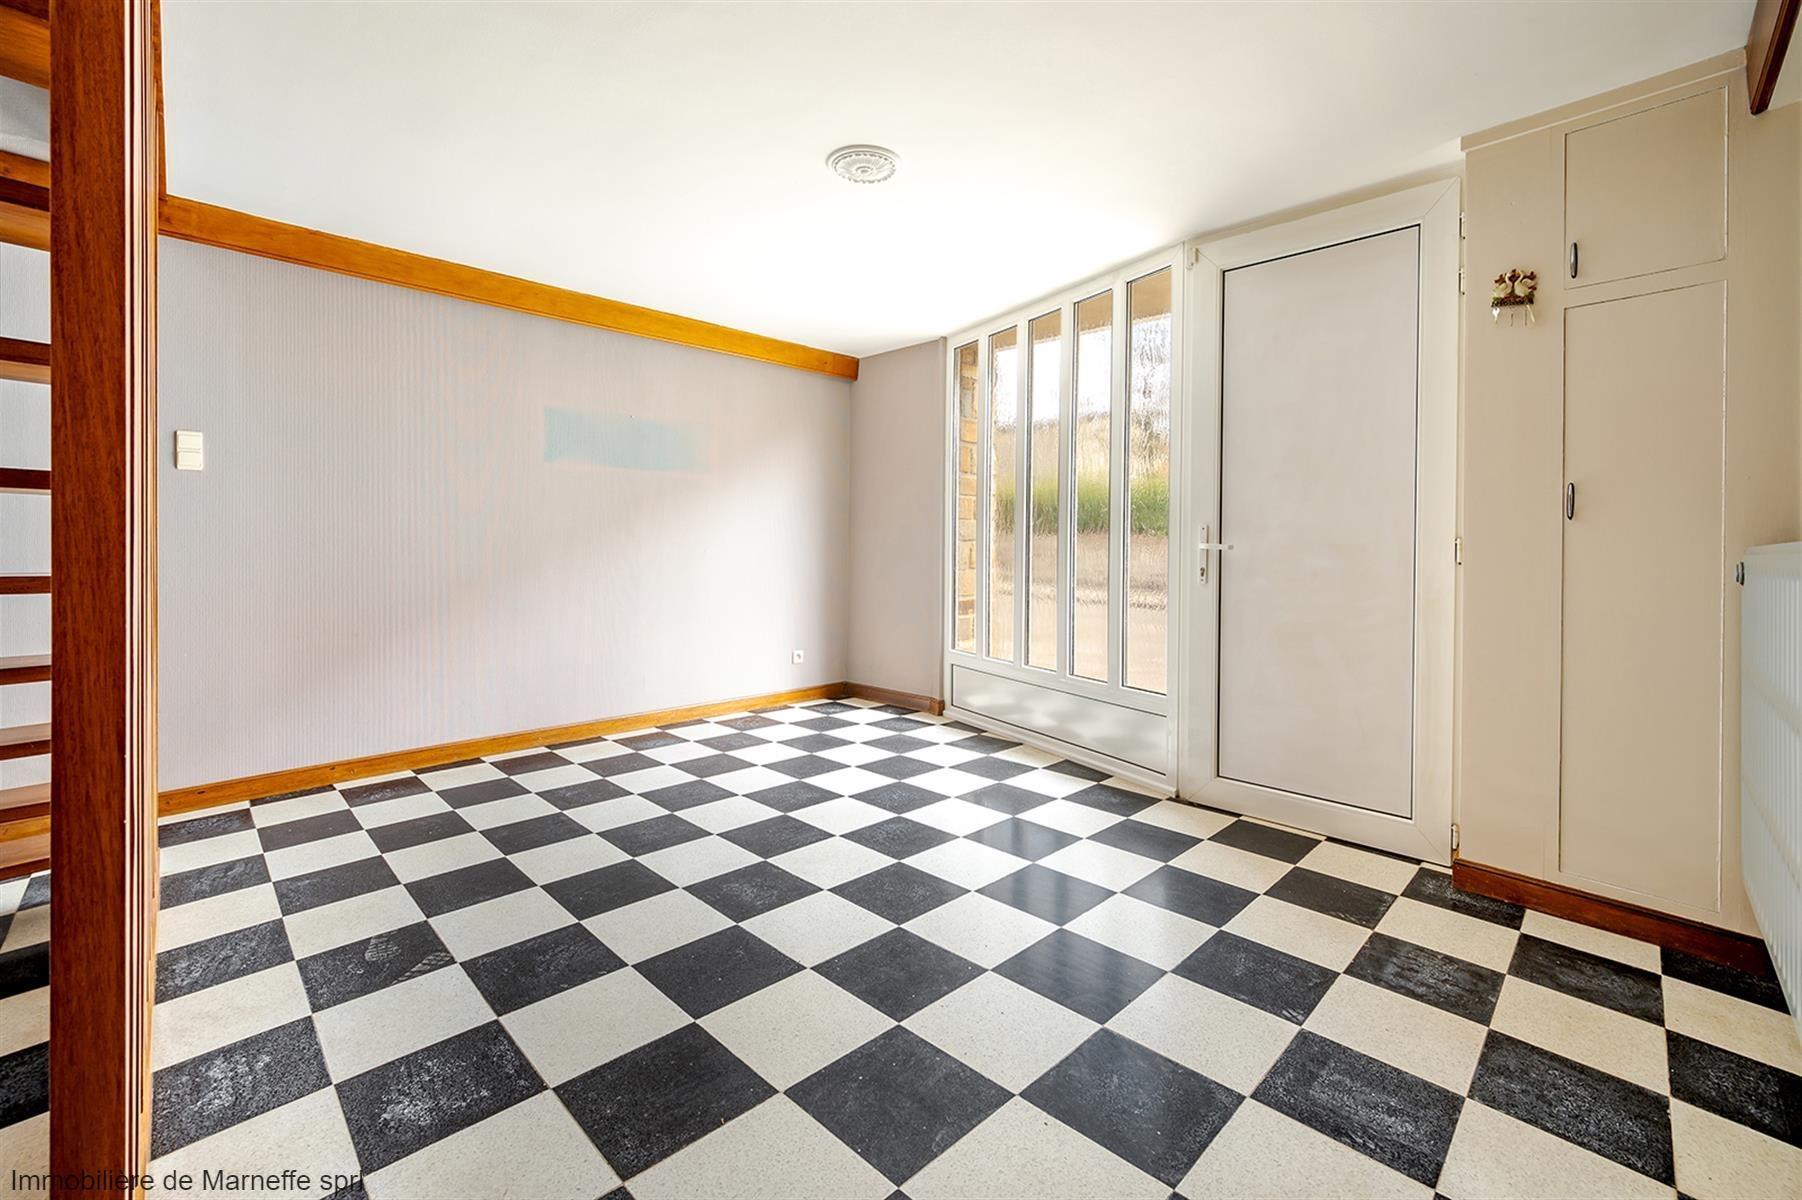 Maison - Berloz - #4343525-4